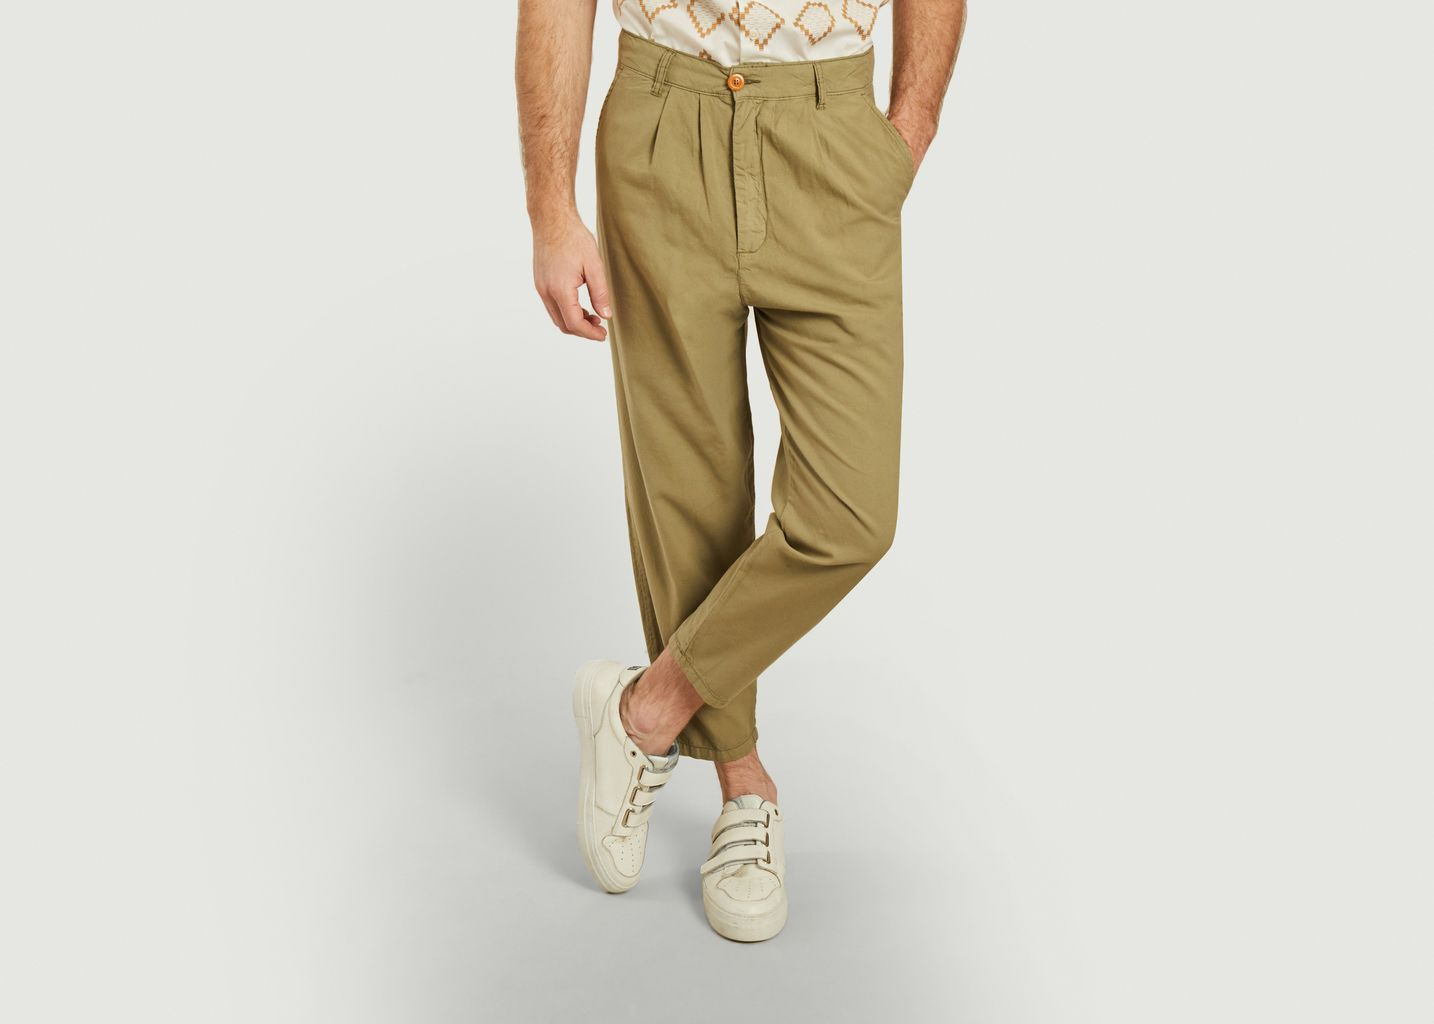 Pantalon Swing 21 - Olow